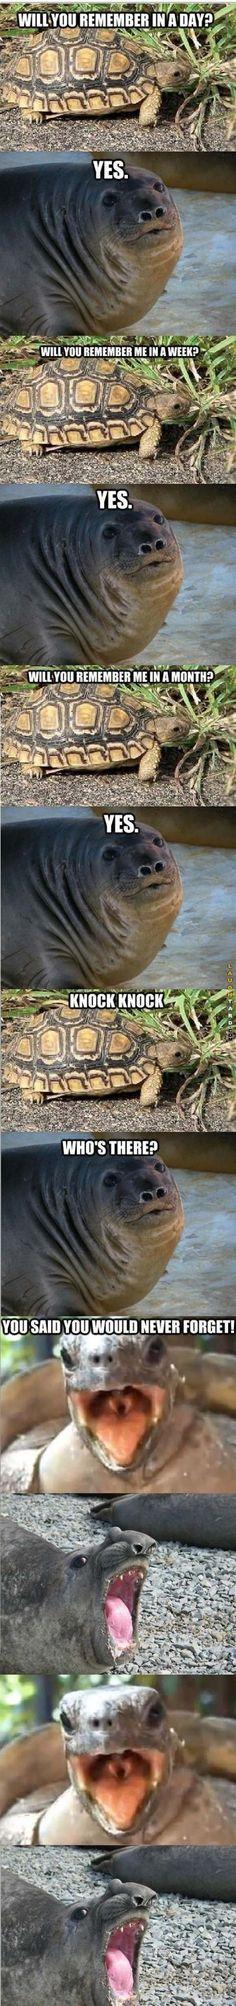 Knock Knock #jokes #funny #group